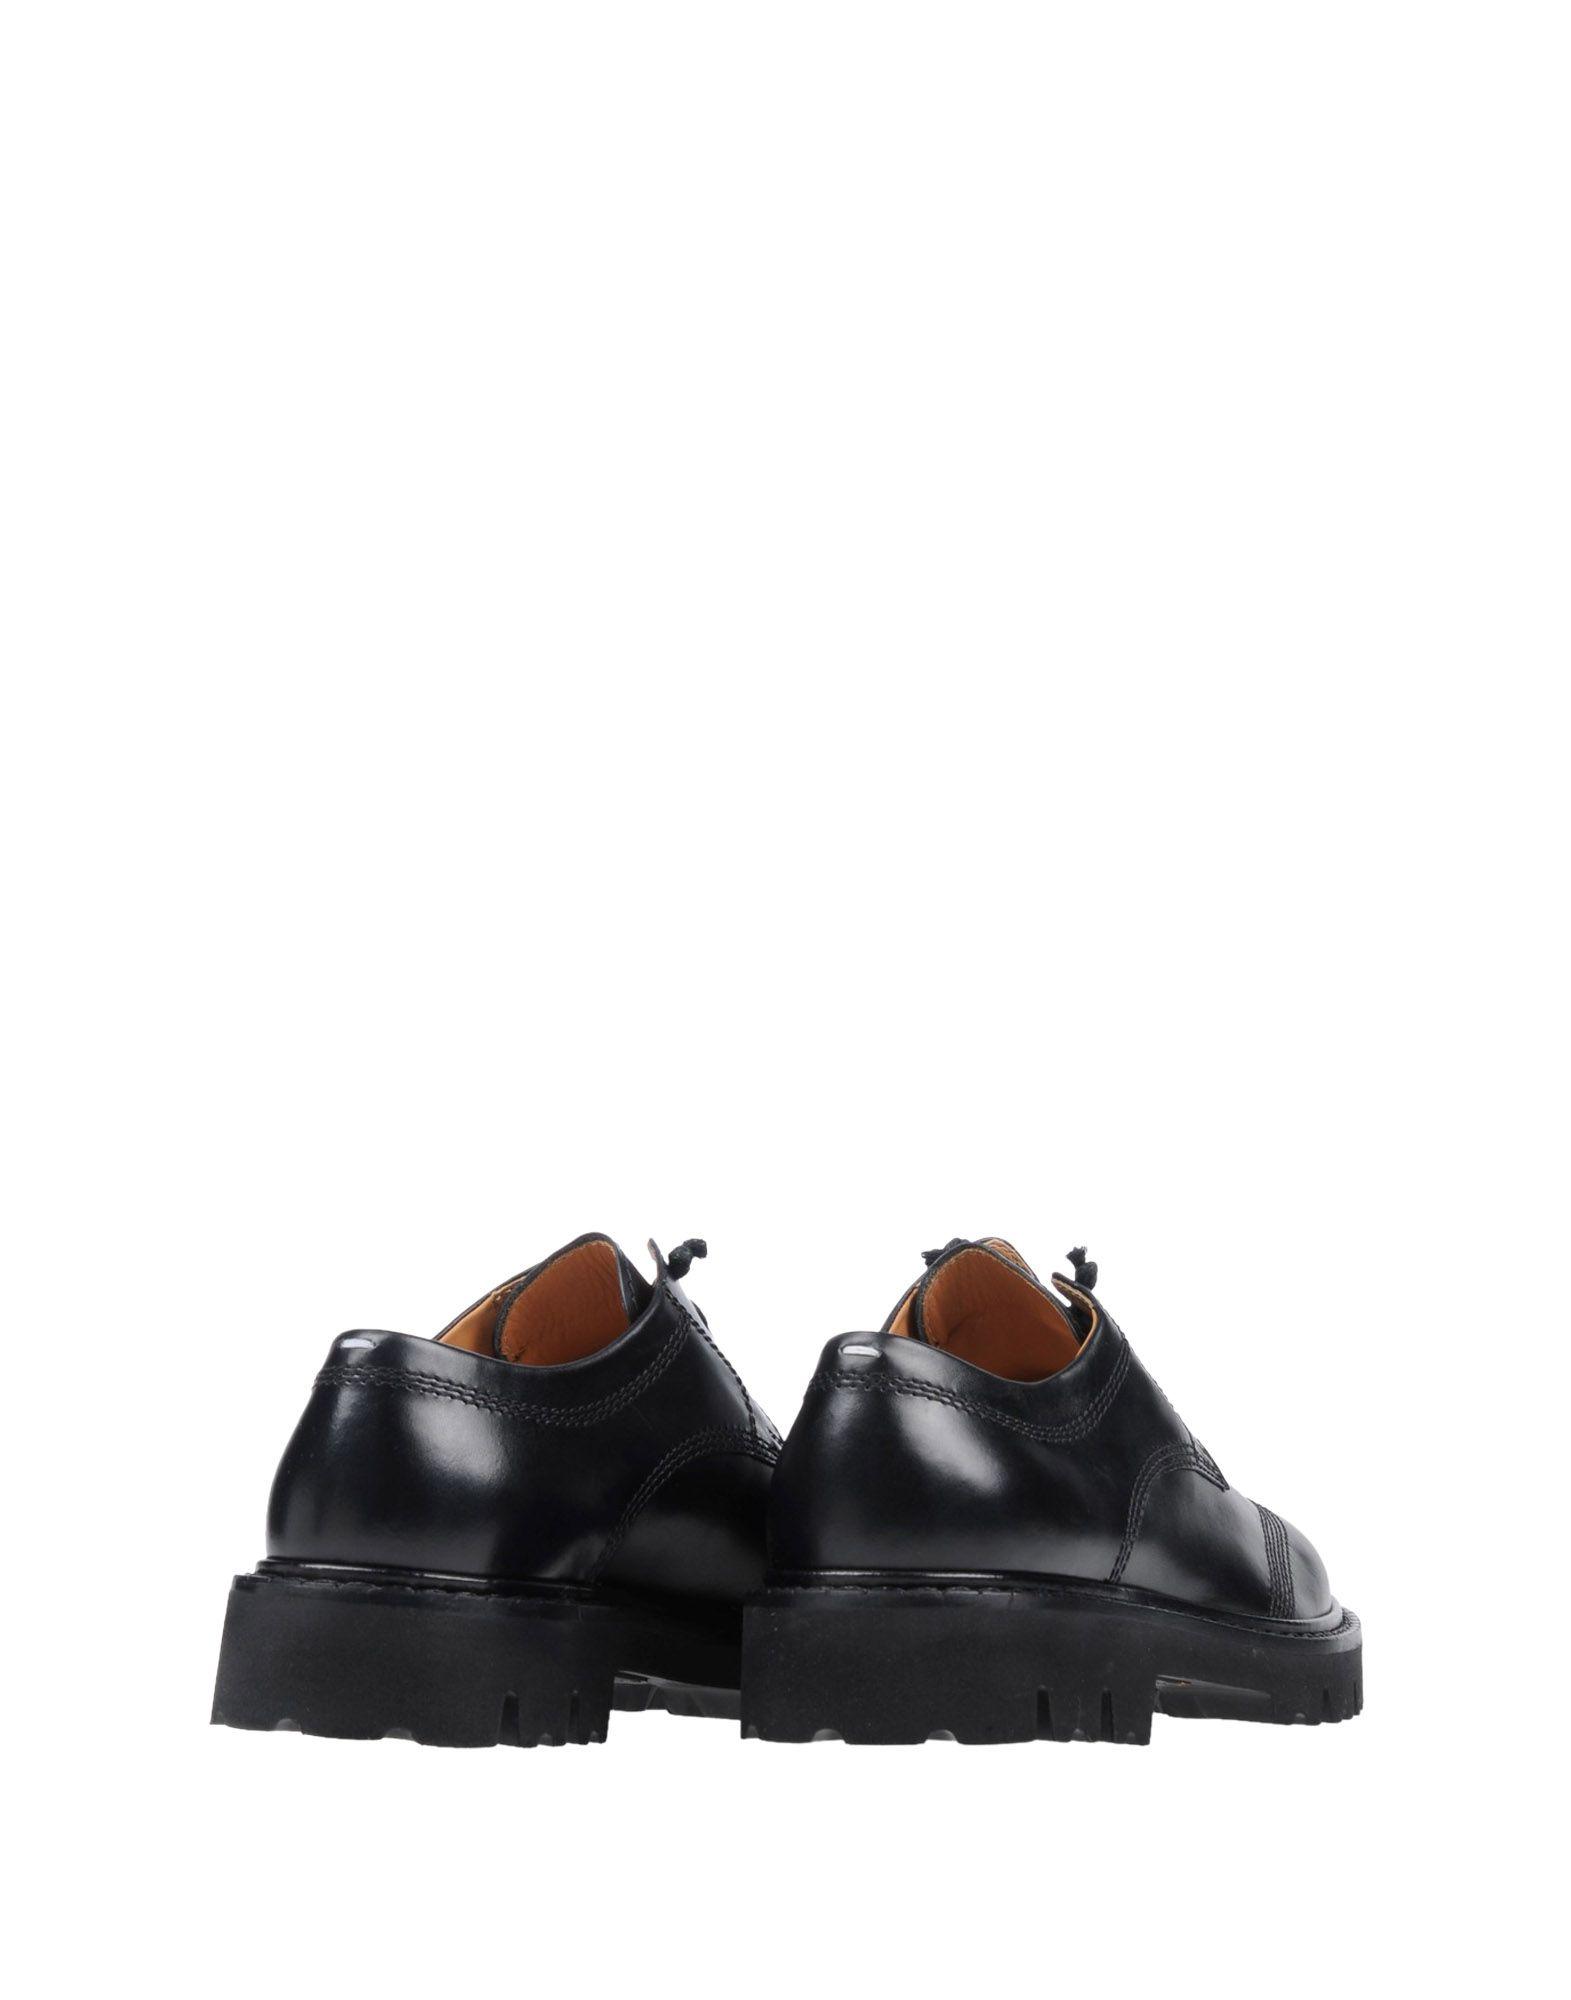 Maison 11472282TB Margiela Schnürschuhe Herren  11472282TB Maison Gute Qualität beliebte Schuhe 947723